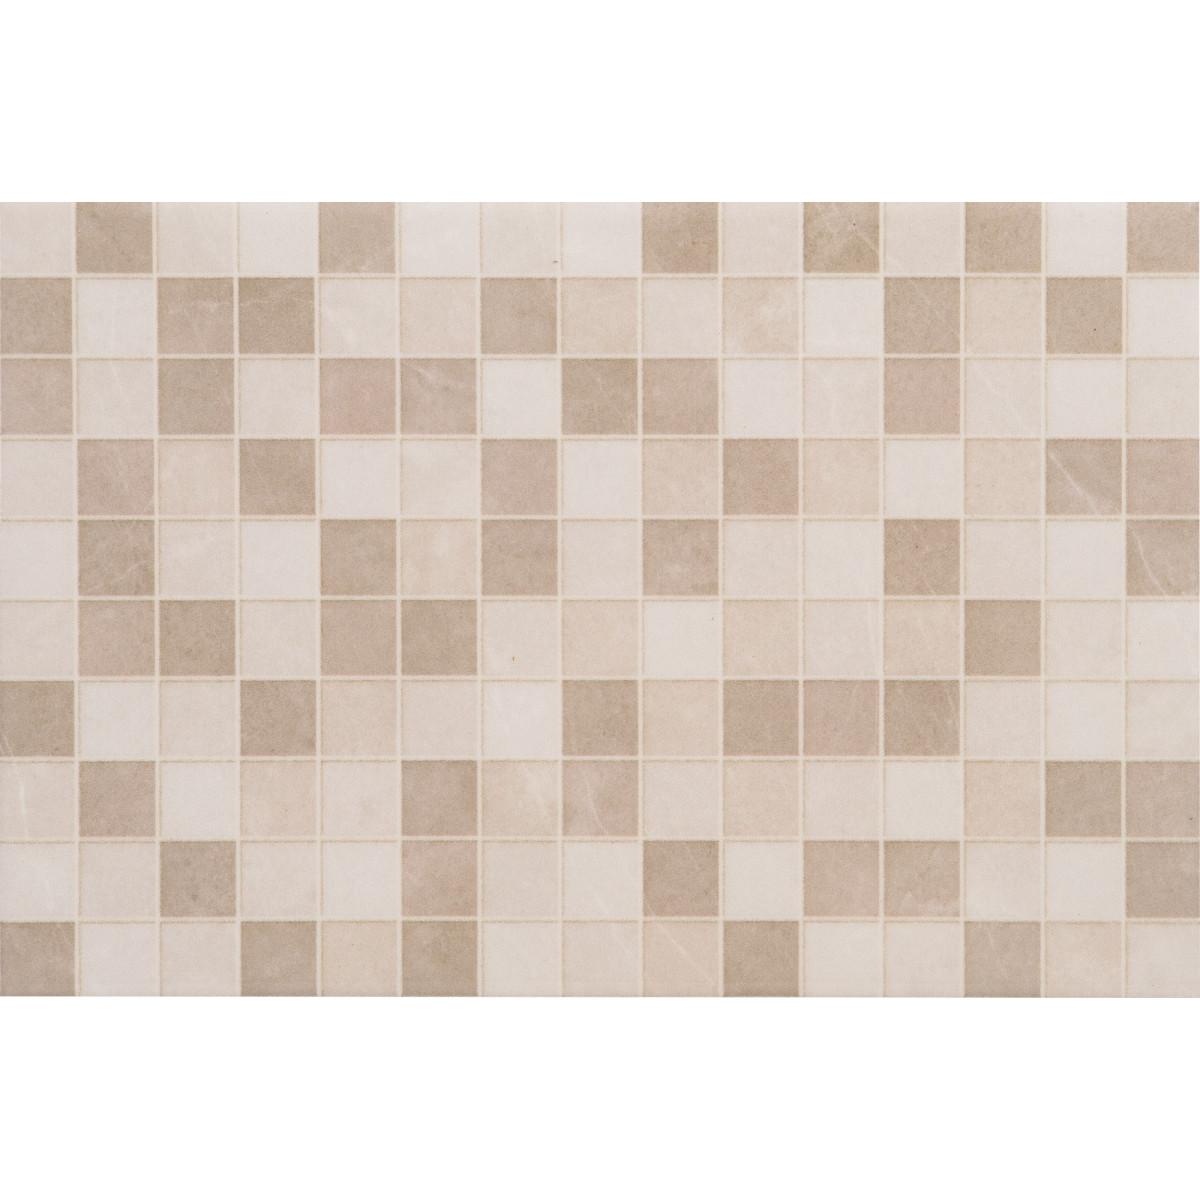 Плитка настенная Дора 20x30 см 144 м² цвет бежевый